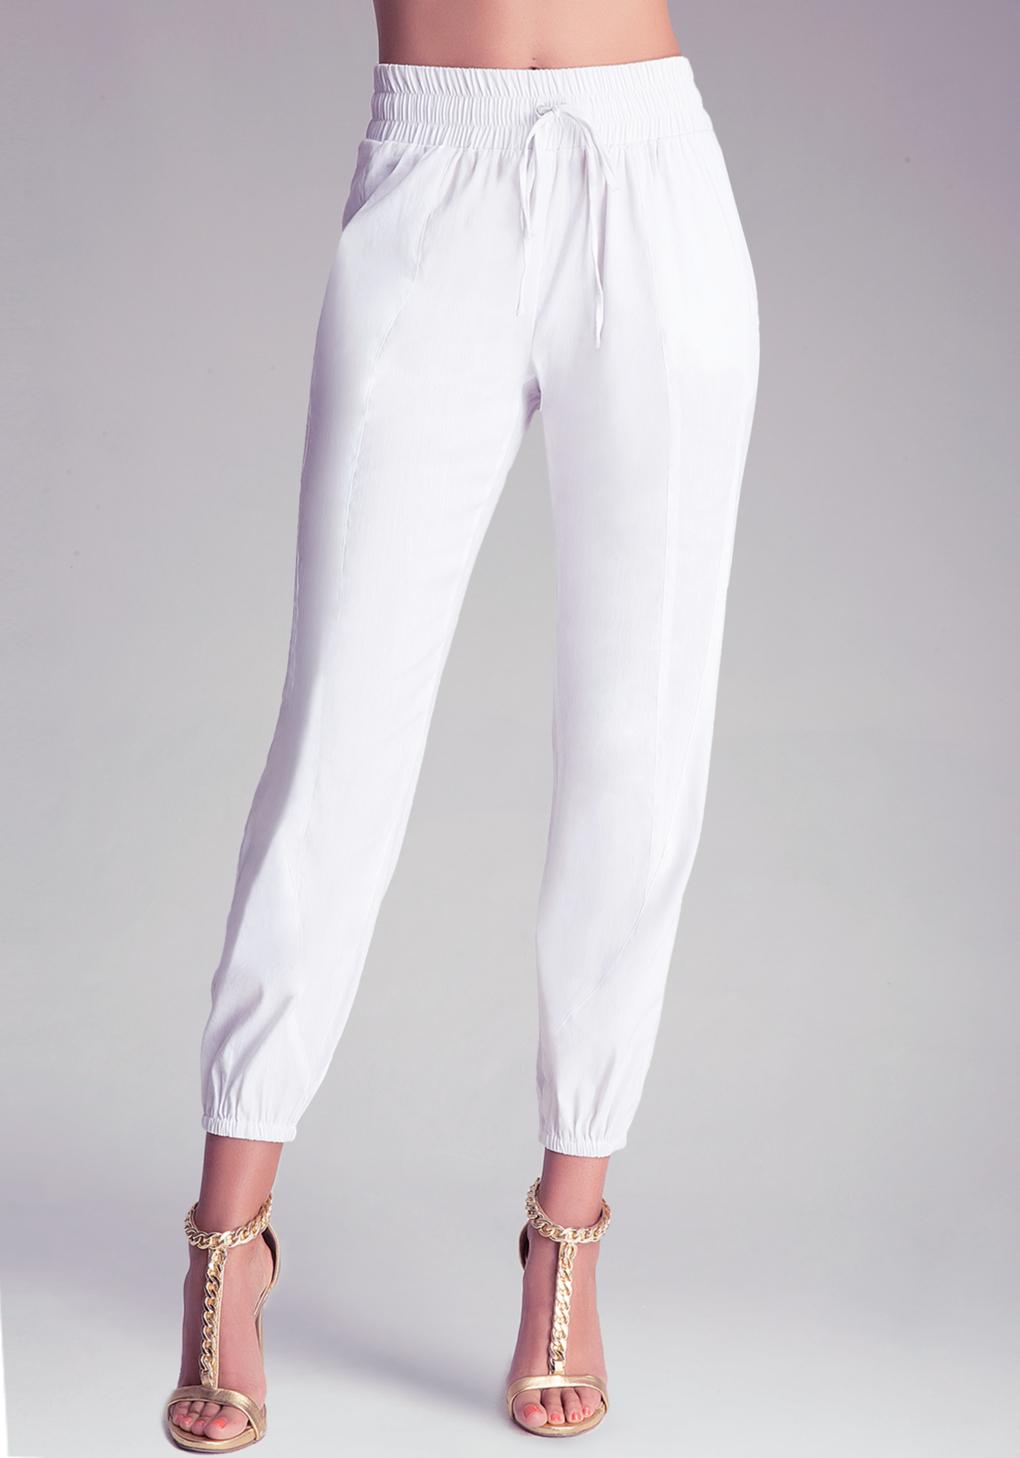 Bebe Drawstring Pants in White | Lyst